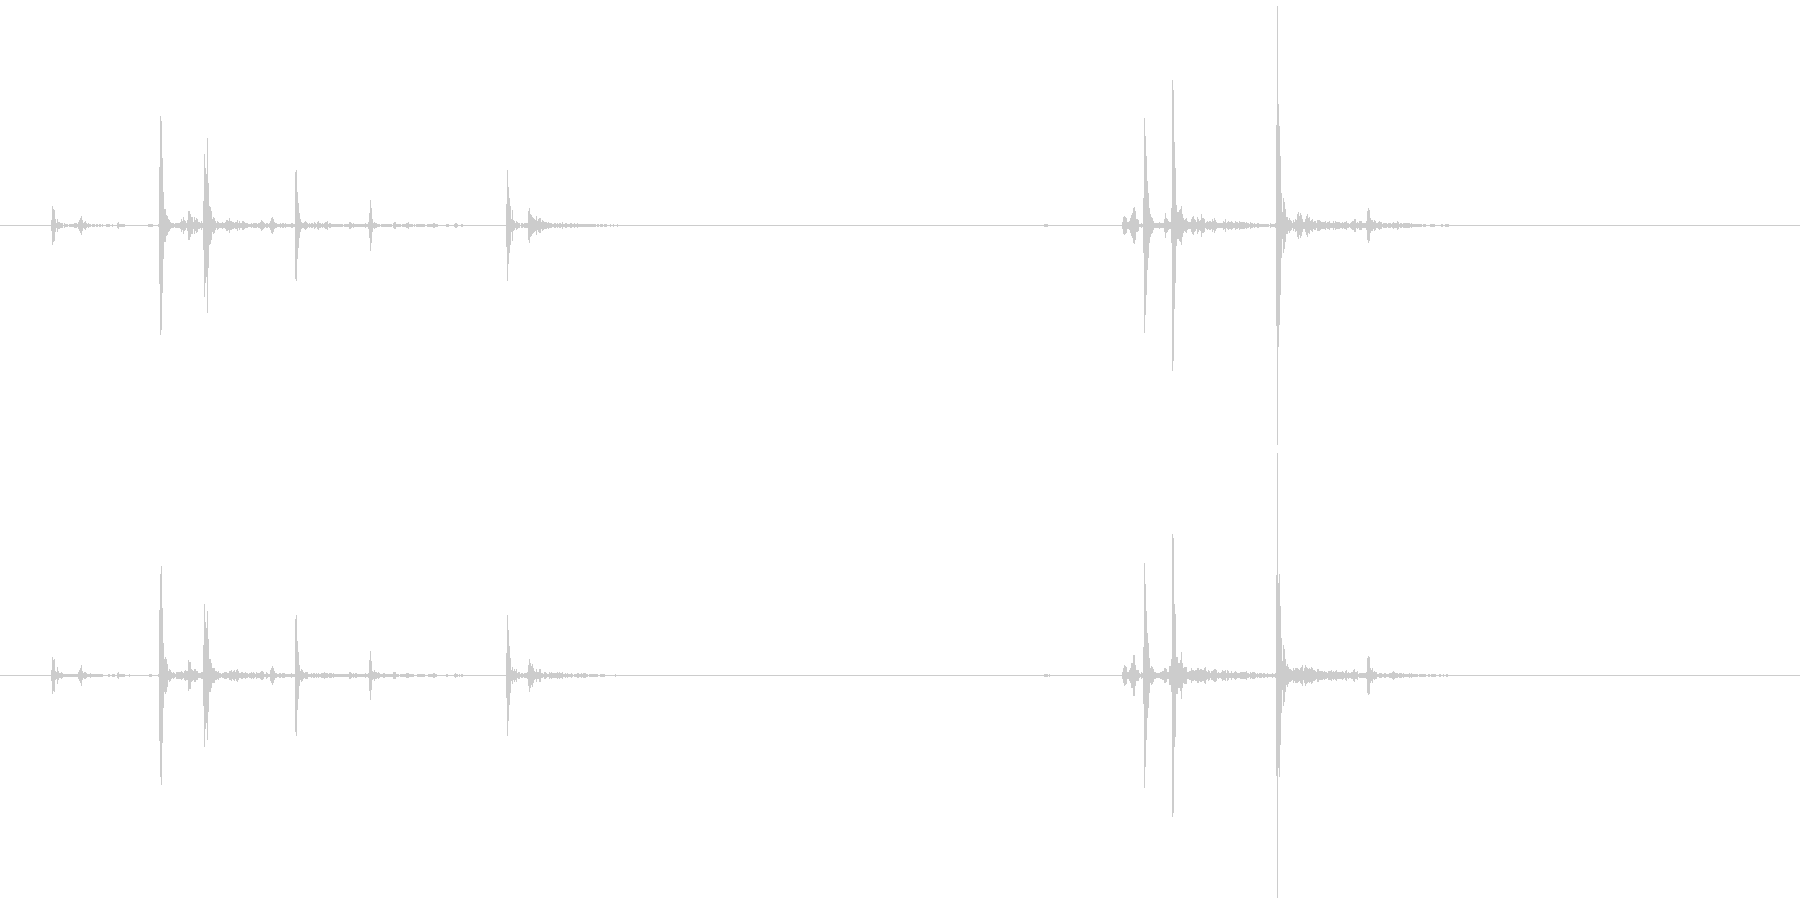 Anime 指の関節を鳴らす音 1の未再生の波形